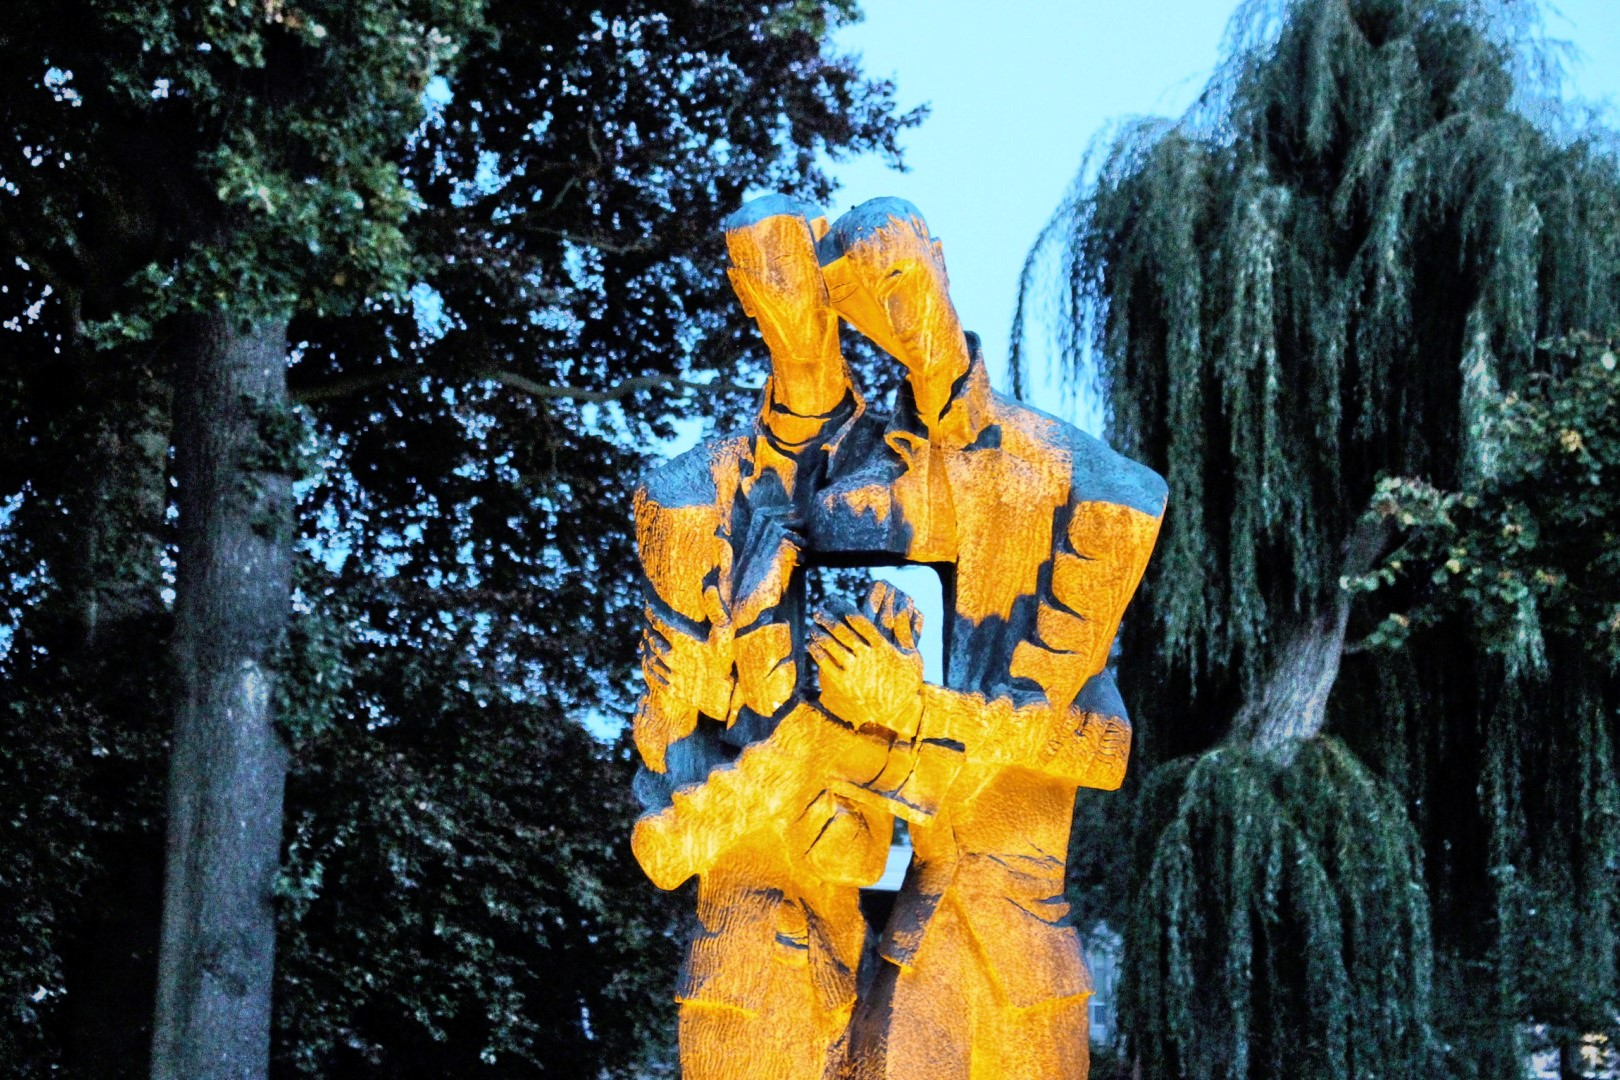 Statue in Zundert / Brabant